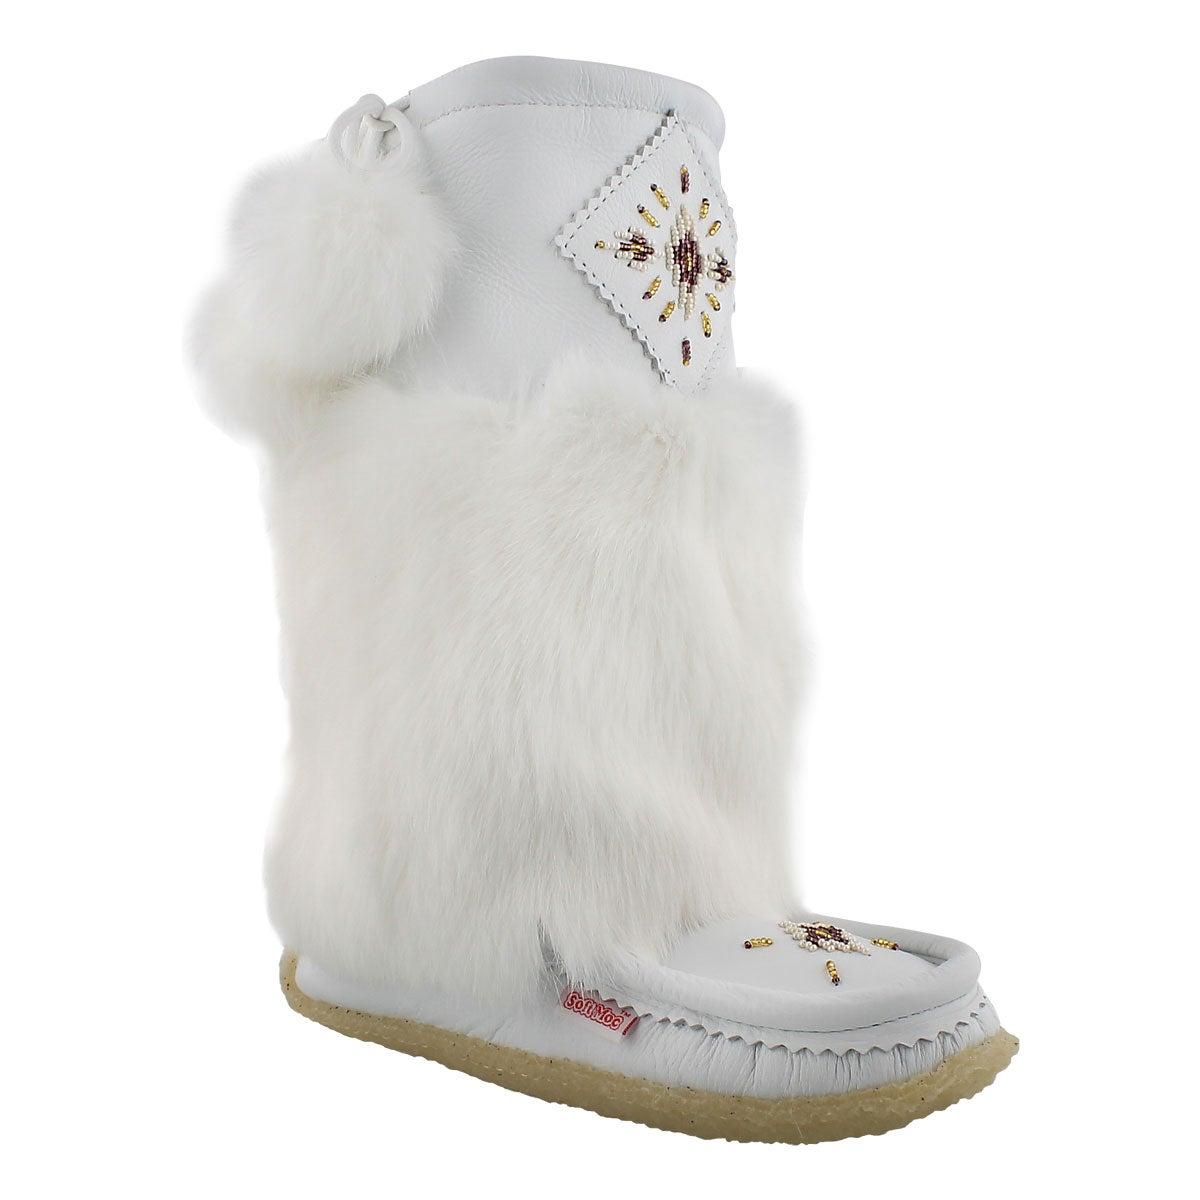 Women's 986447 white leather rabbit fur mukluks